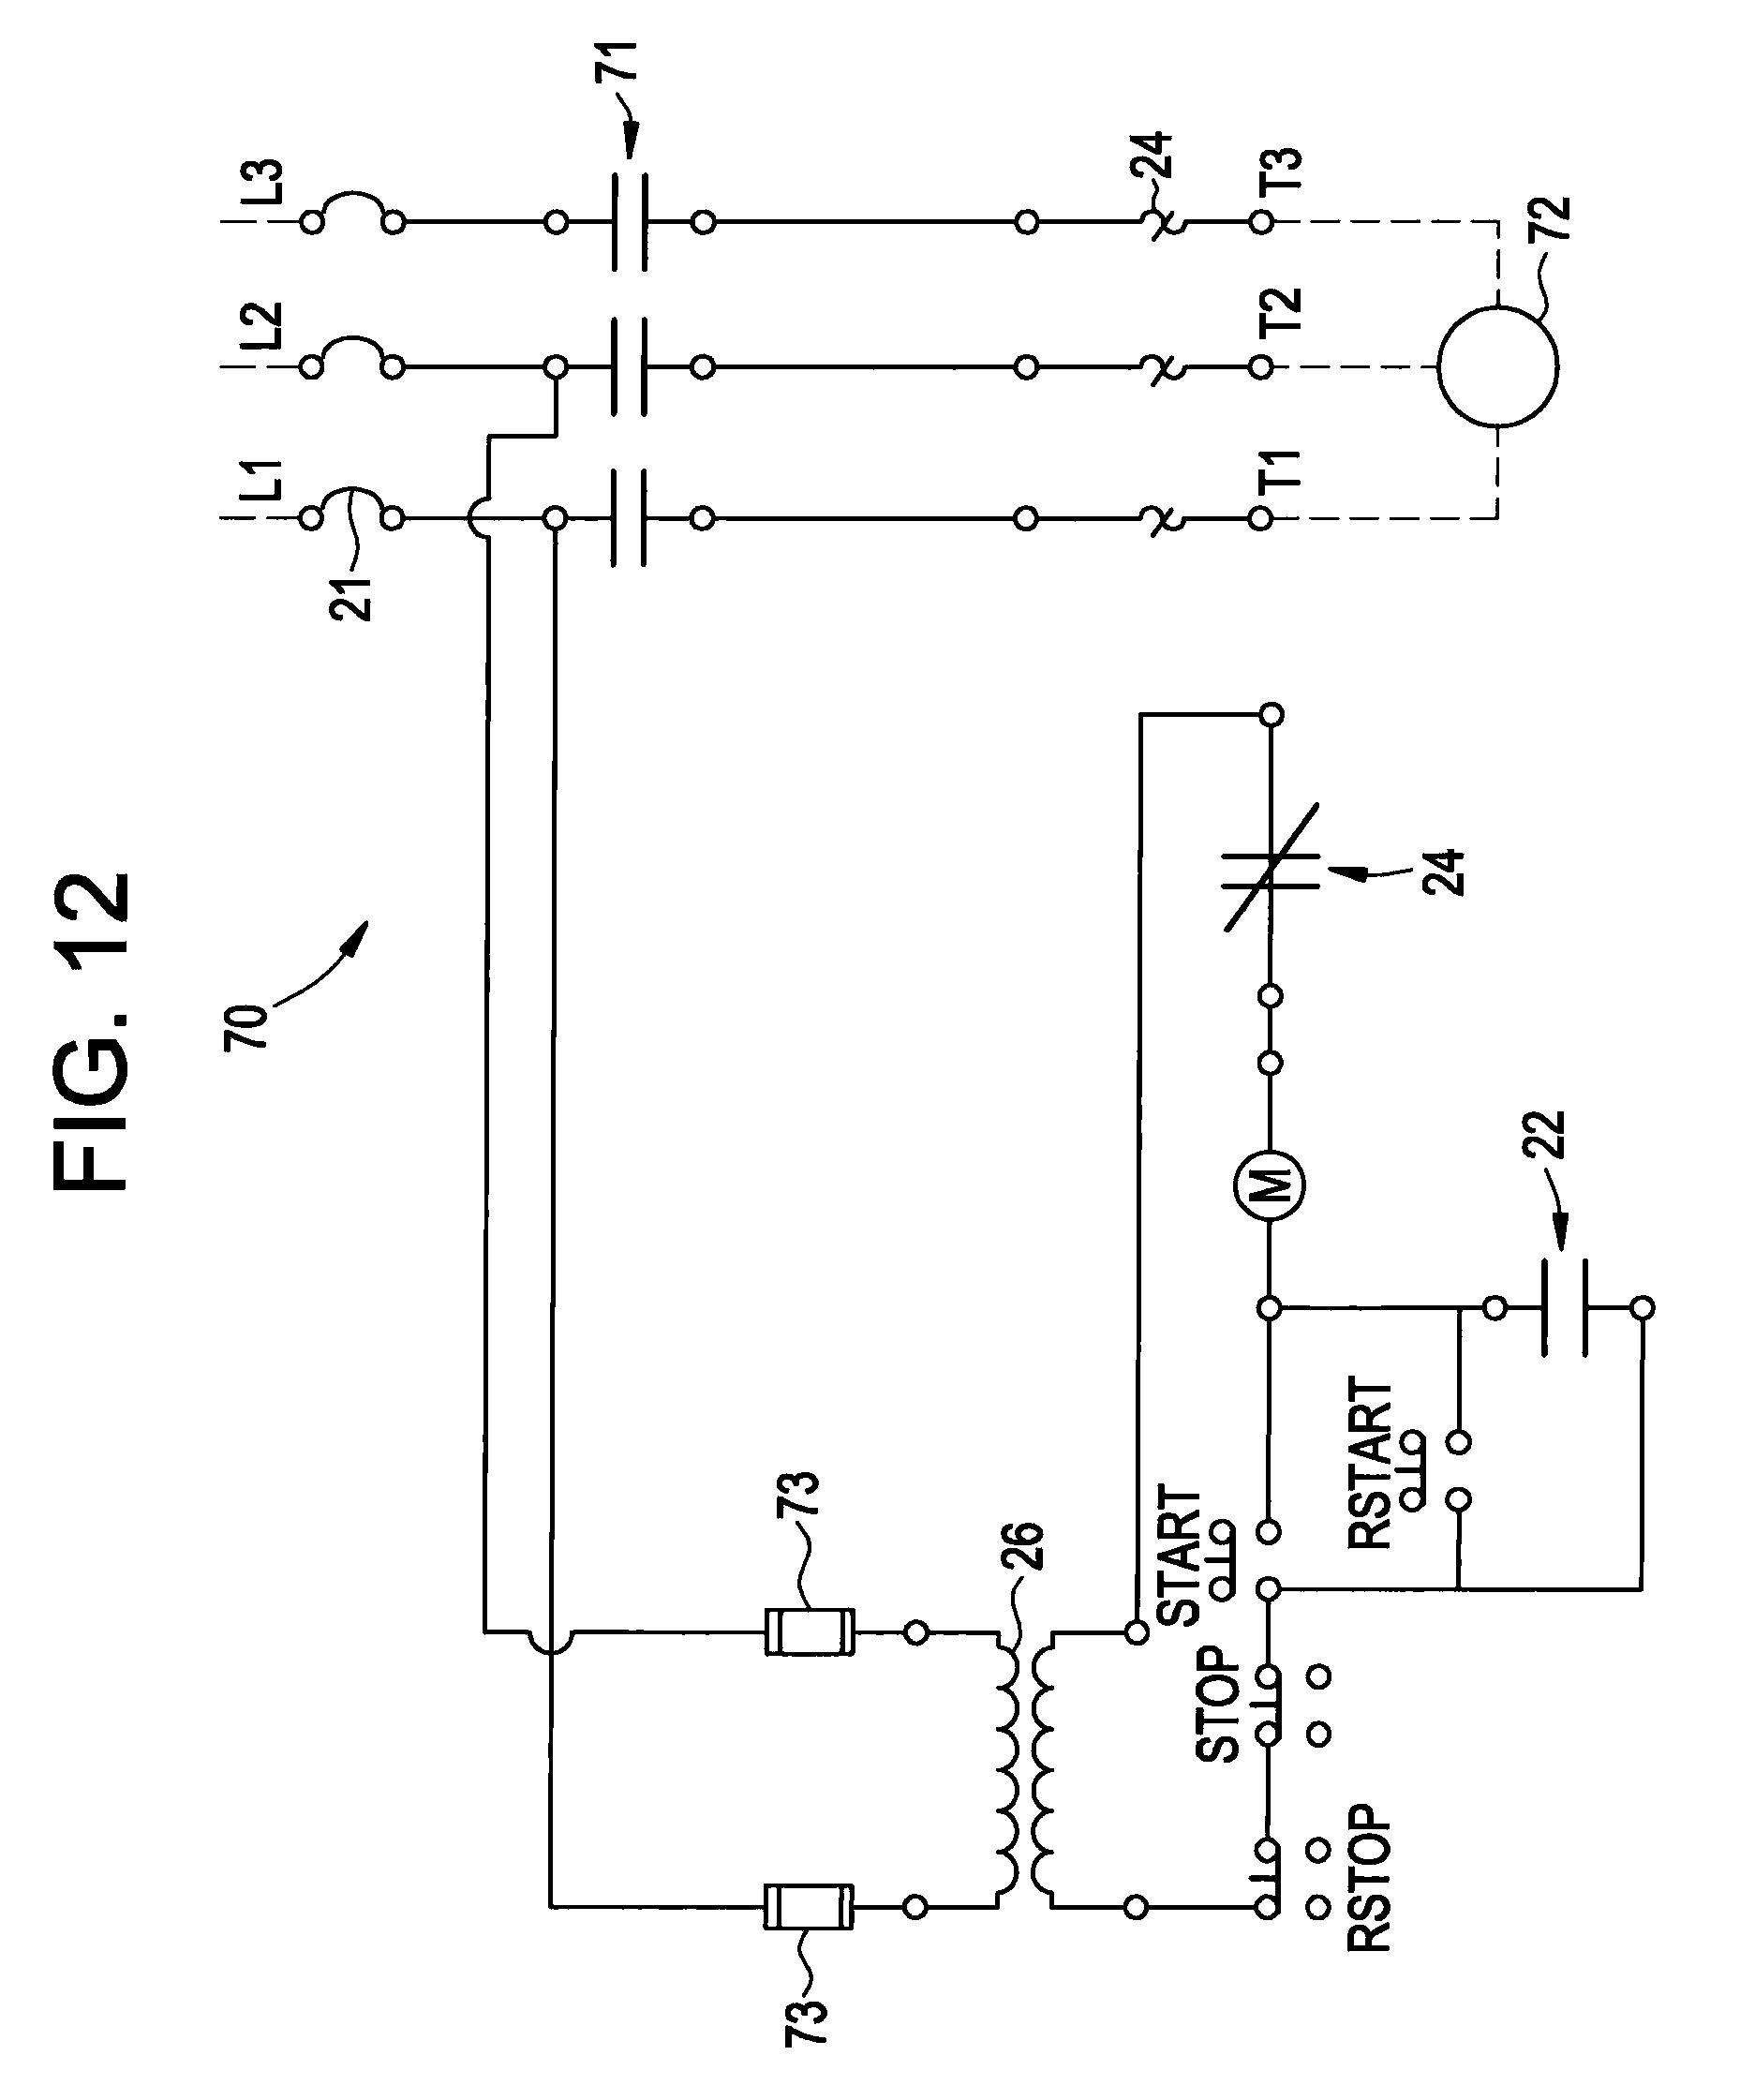 hight resolution of mcc bucket diagram main